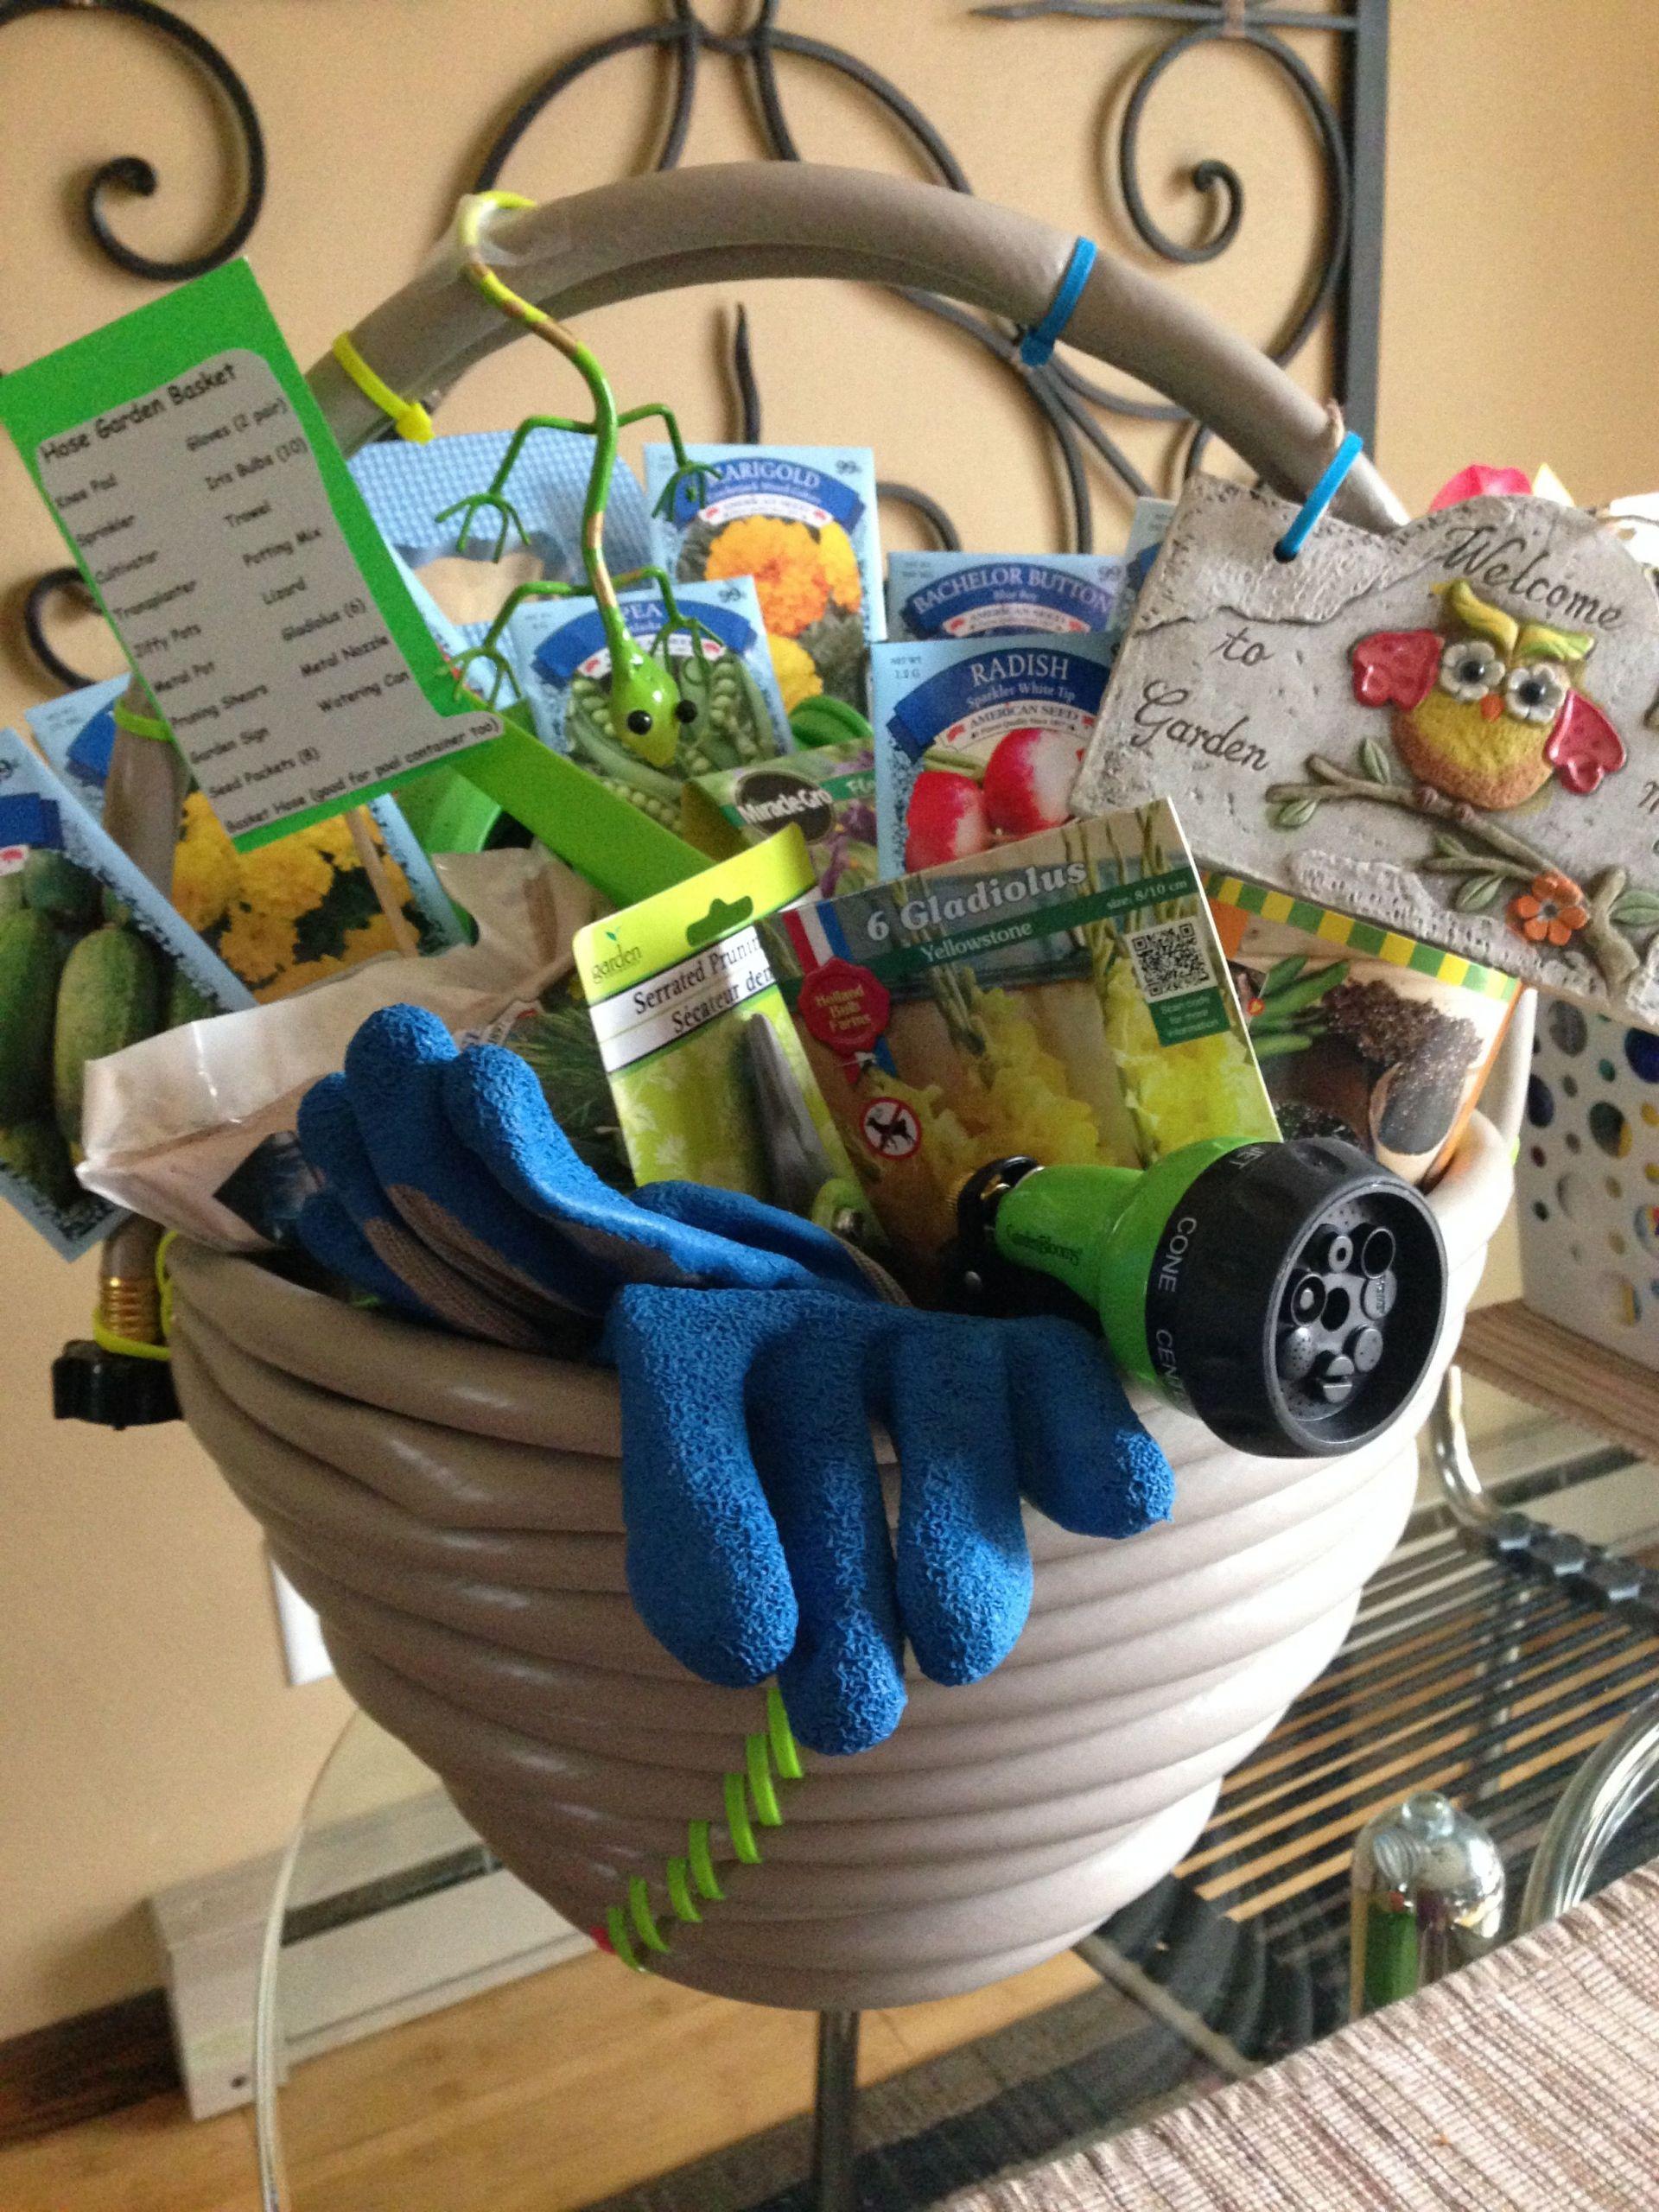 Garden Themed Gift Basket Ideas  Garden hose basket For a fundraiser